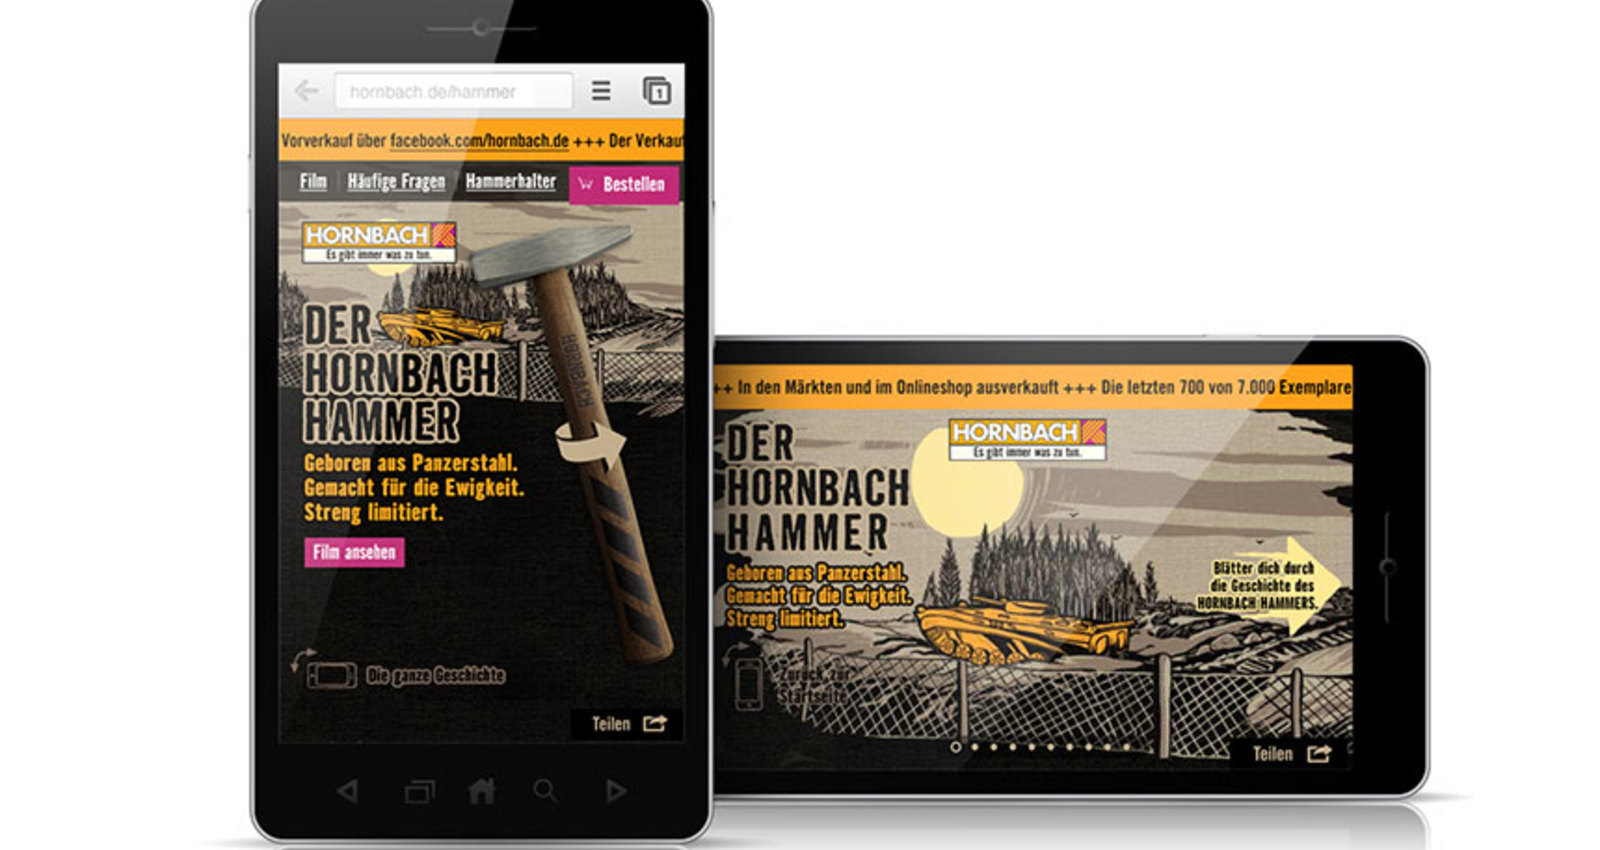 The Hornbach Hammer